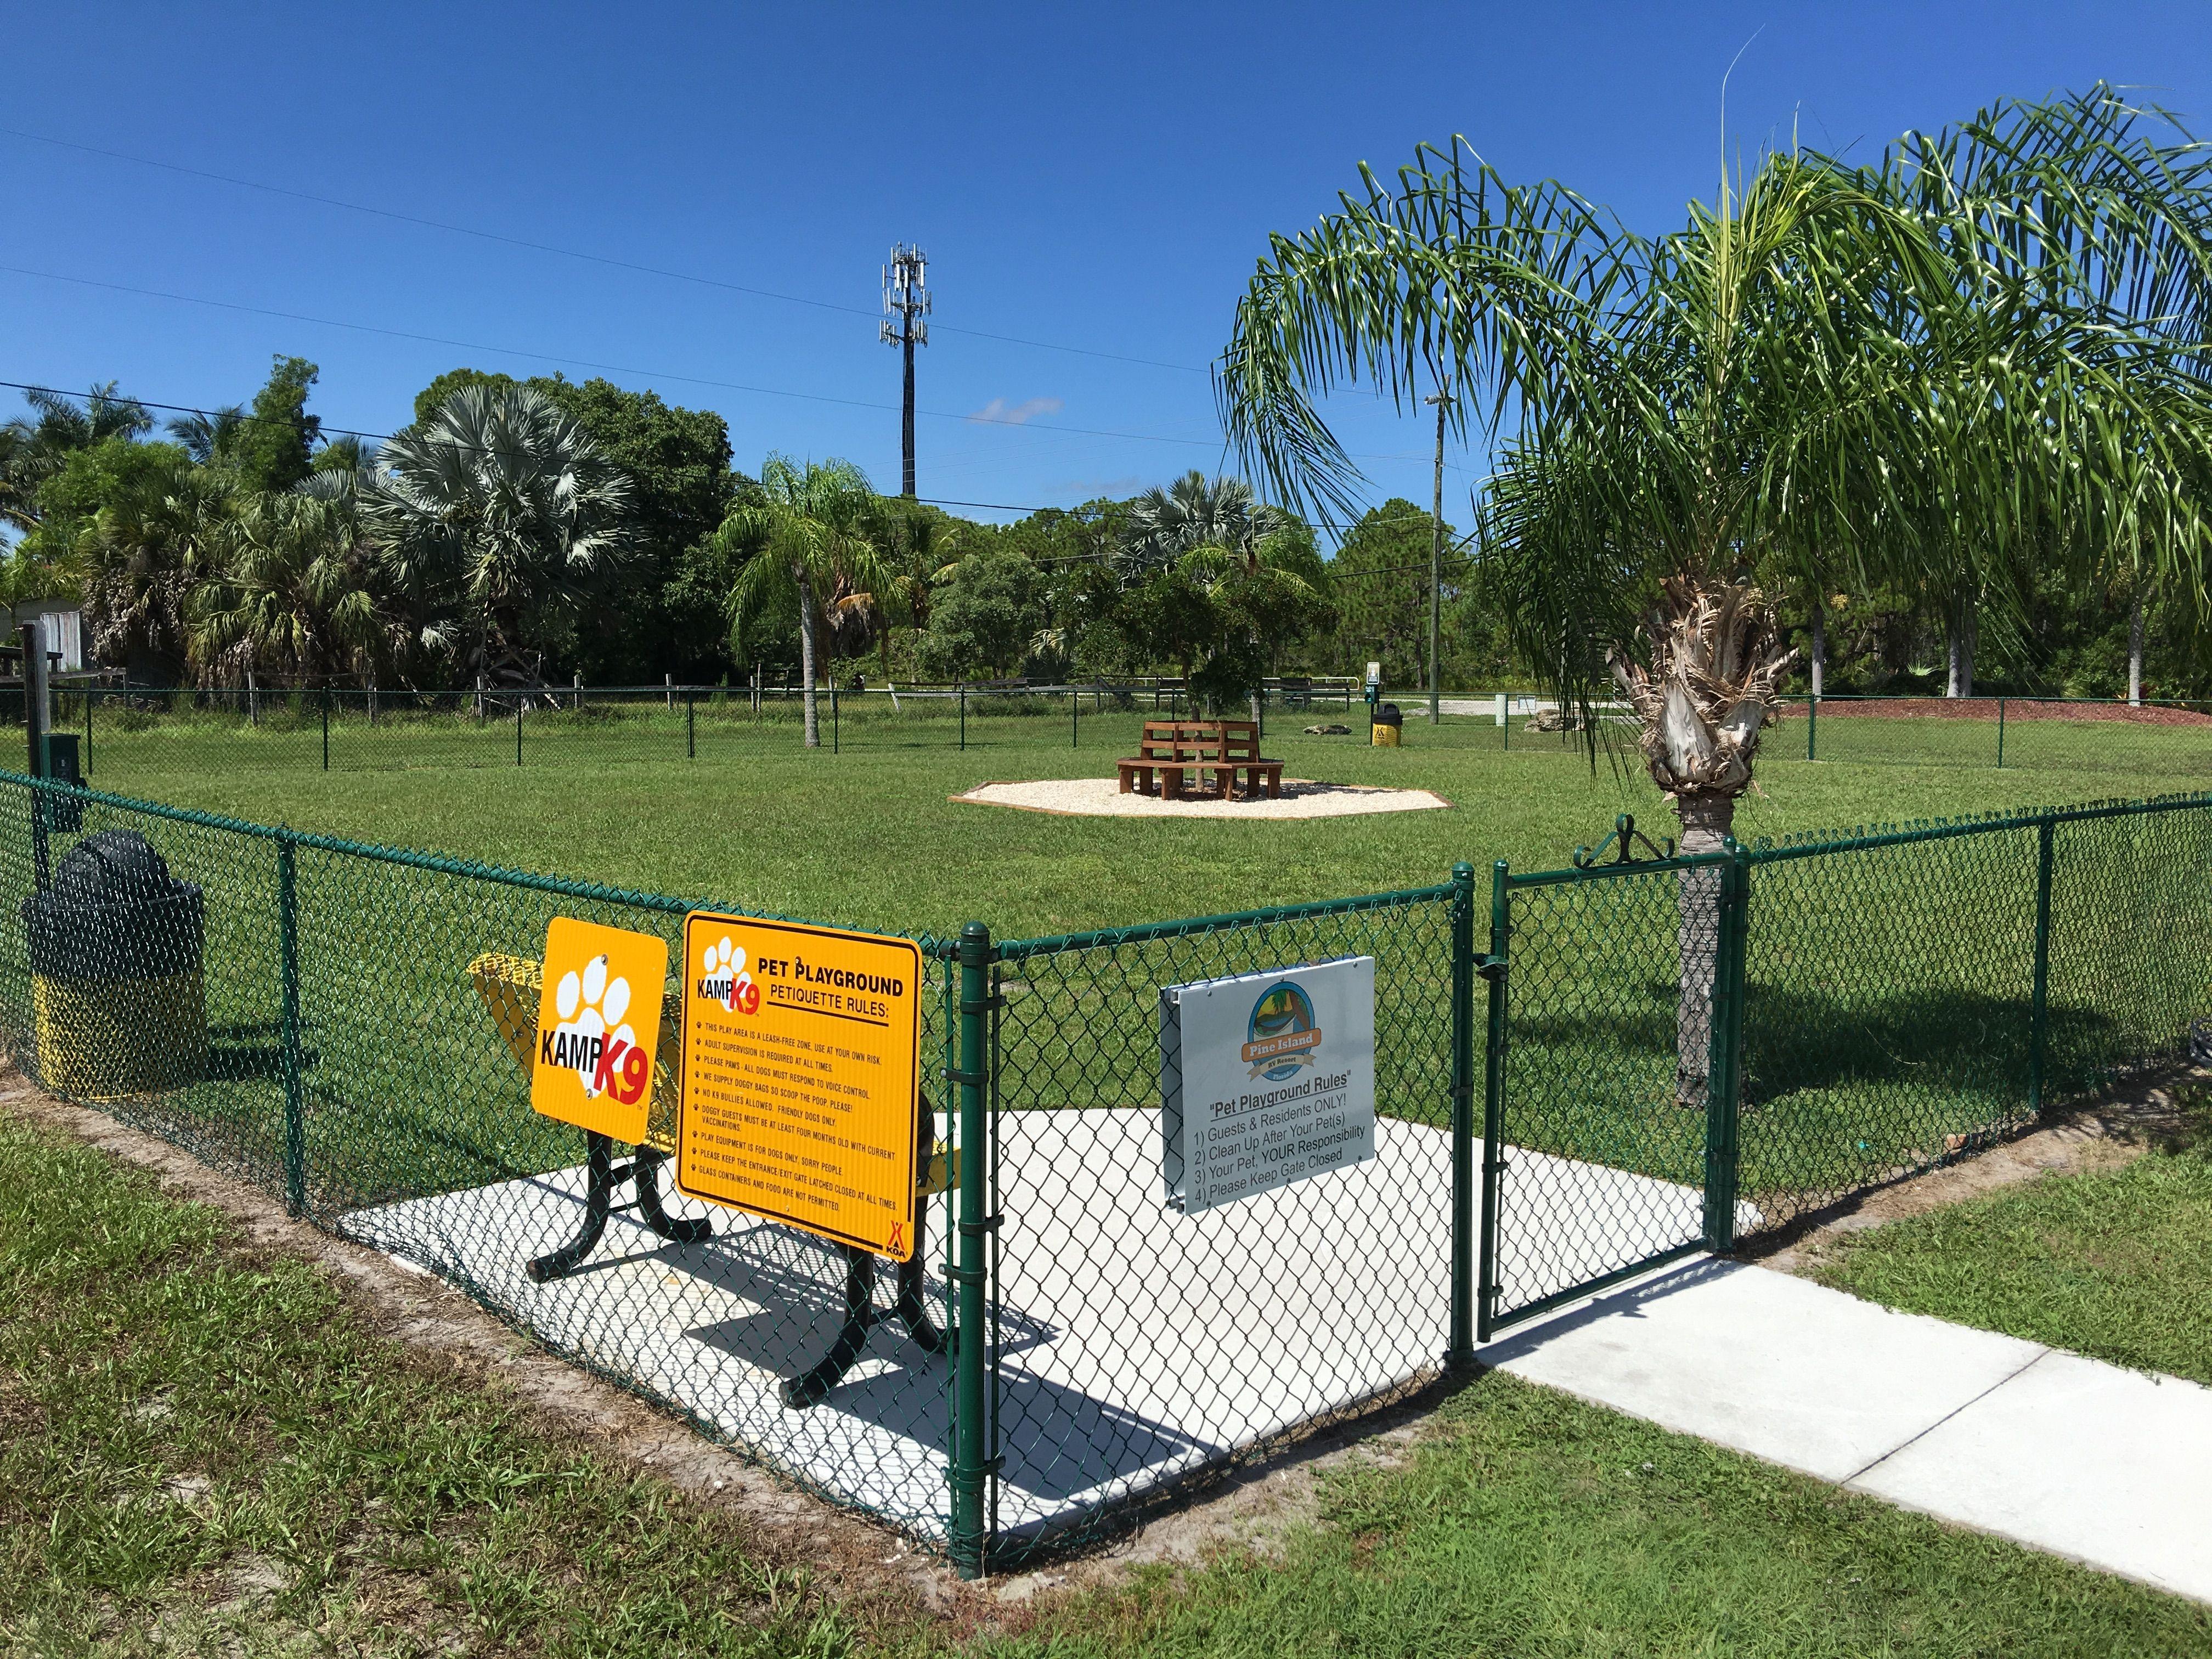 Big Kamp K9 Park At The Fort Myers Pine Island Koa Florida Campgrounds Pine Island Fort Myers